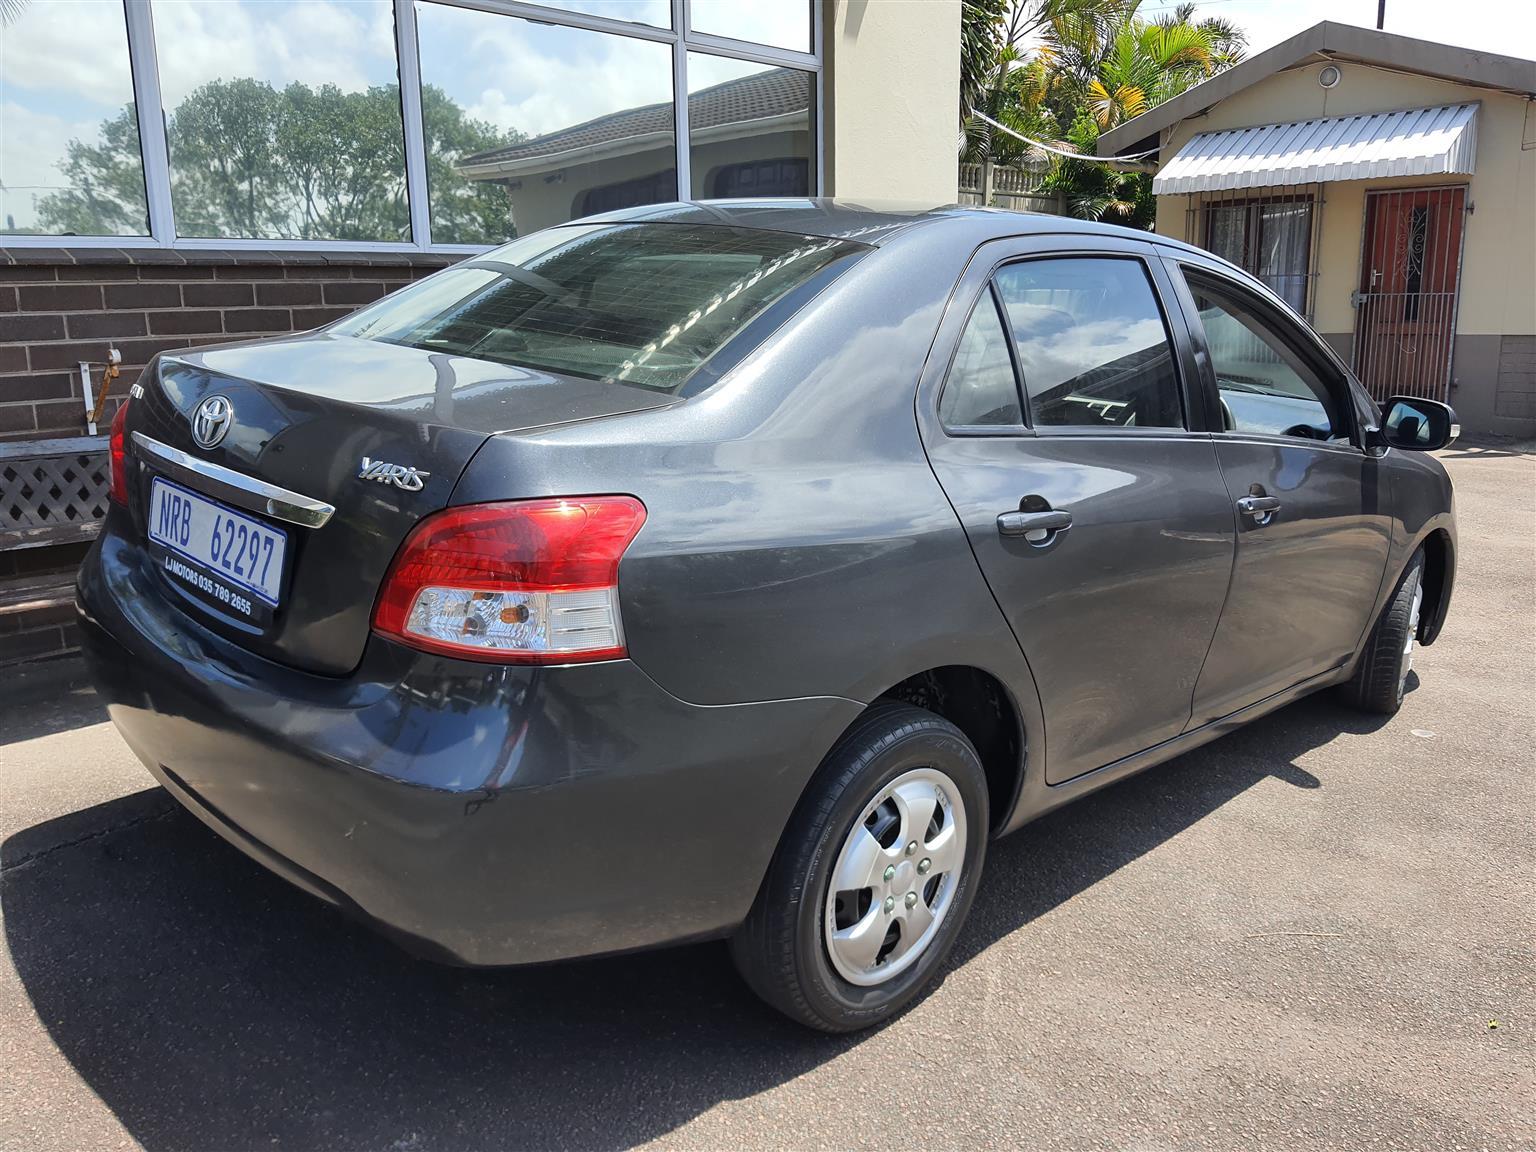 2010 Toyota Yaris 1.3I, Automatic